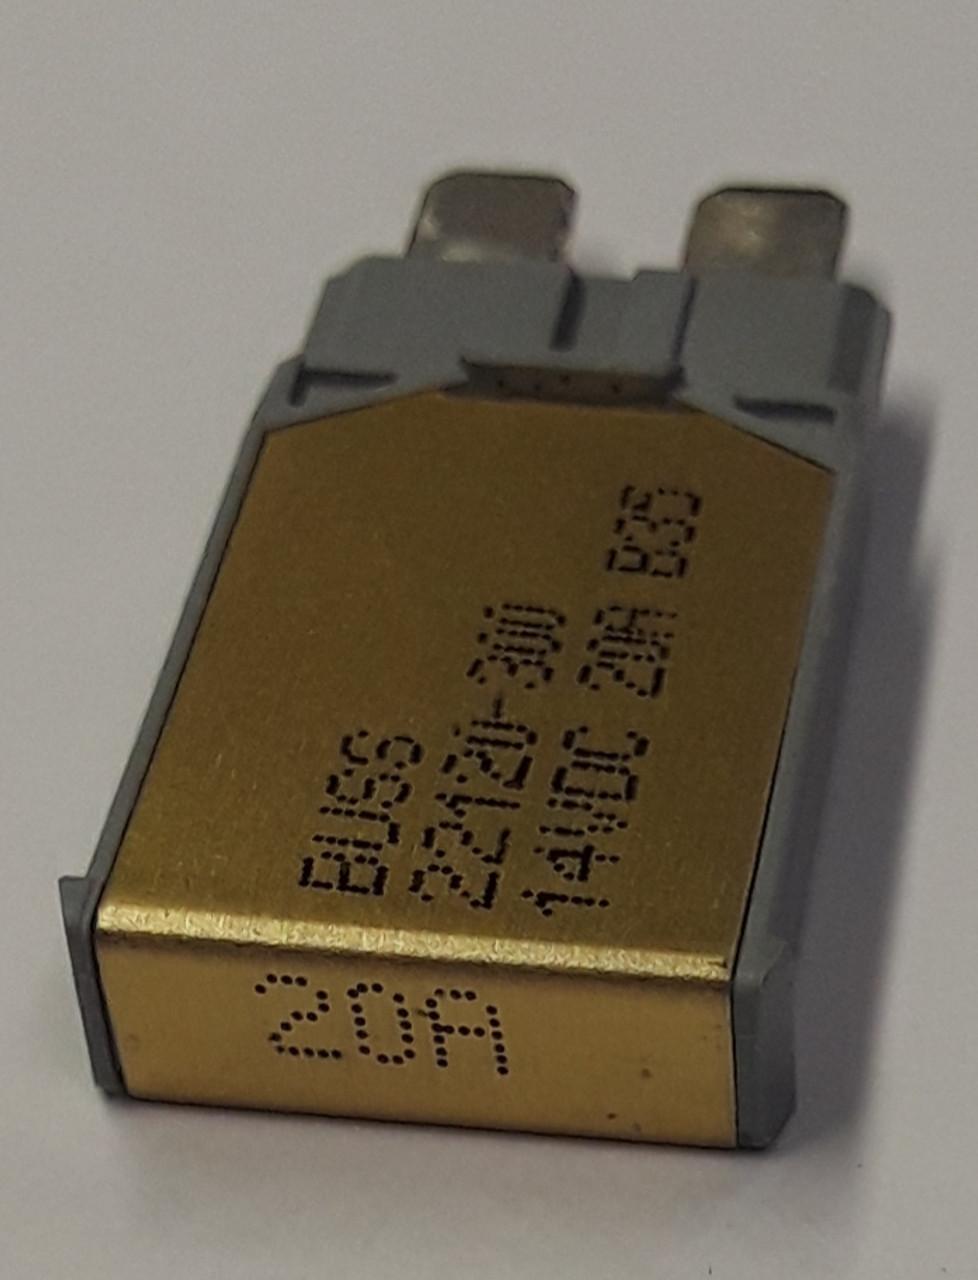 22120-300 cooper bussmann type 1 mini circuit breaker, auto reset, 20 amps